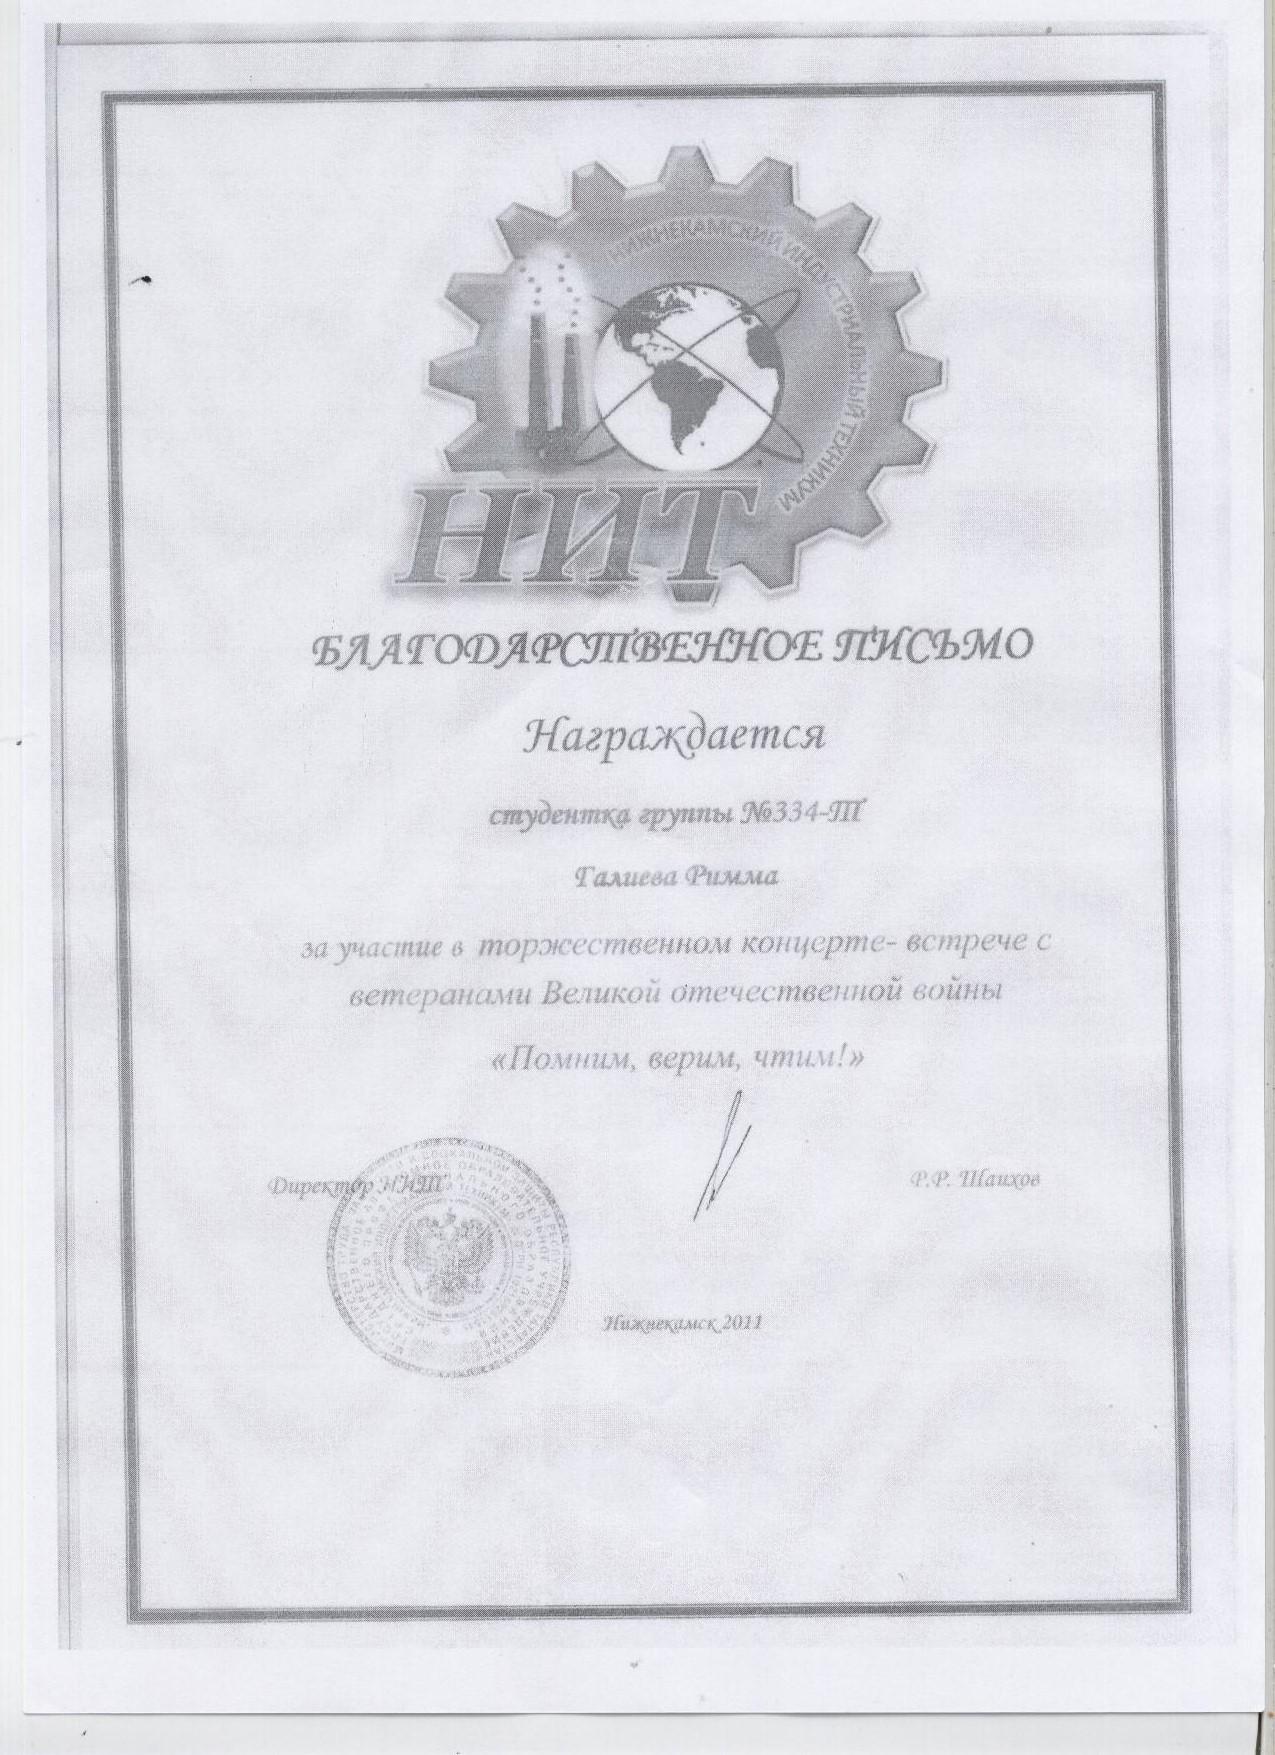 F:\Всероссйский конкурс Портфолио выпускника\РИММА\Римма 010.jpg